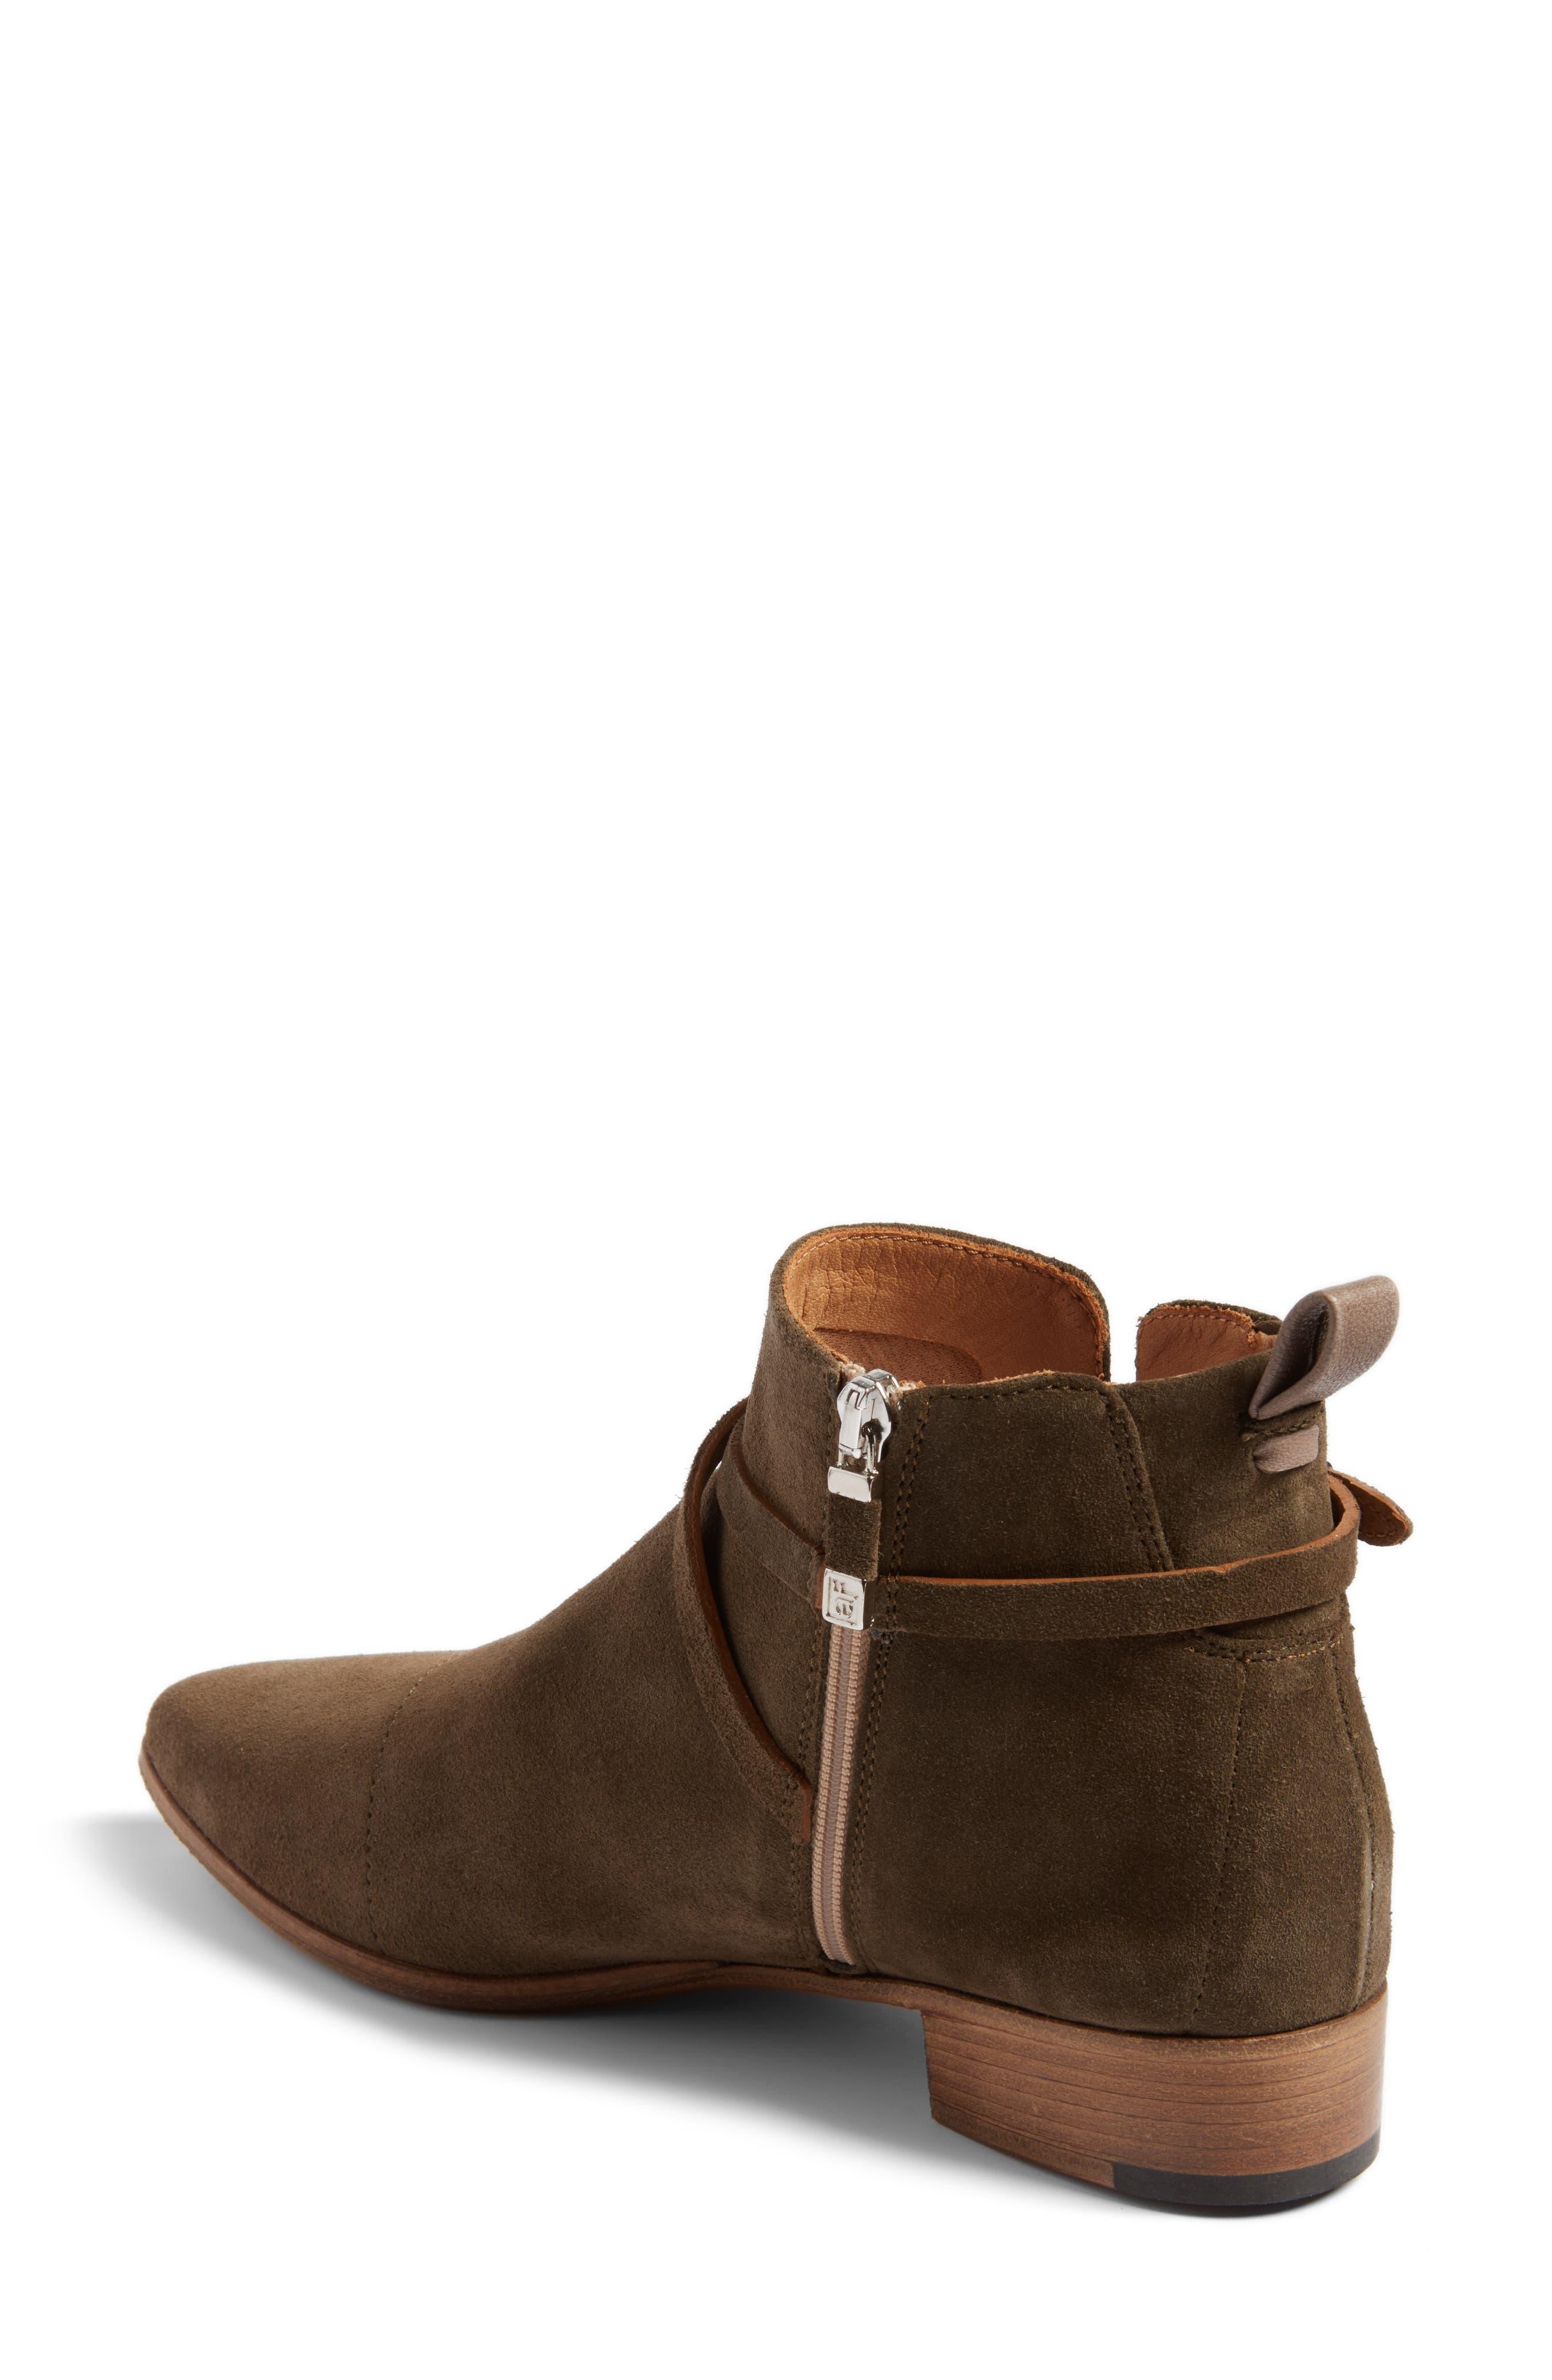 Alternate Image 2  - Alberto Fermani 'Mea' Ankle Boot (Women) (Nordstrom Exclusive)